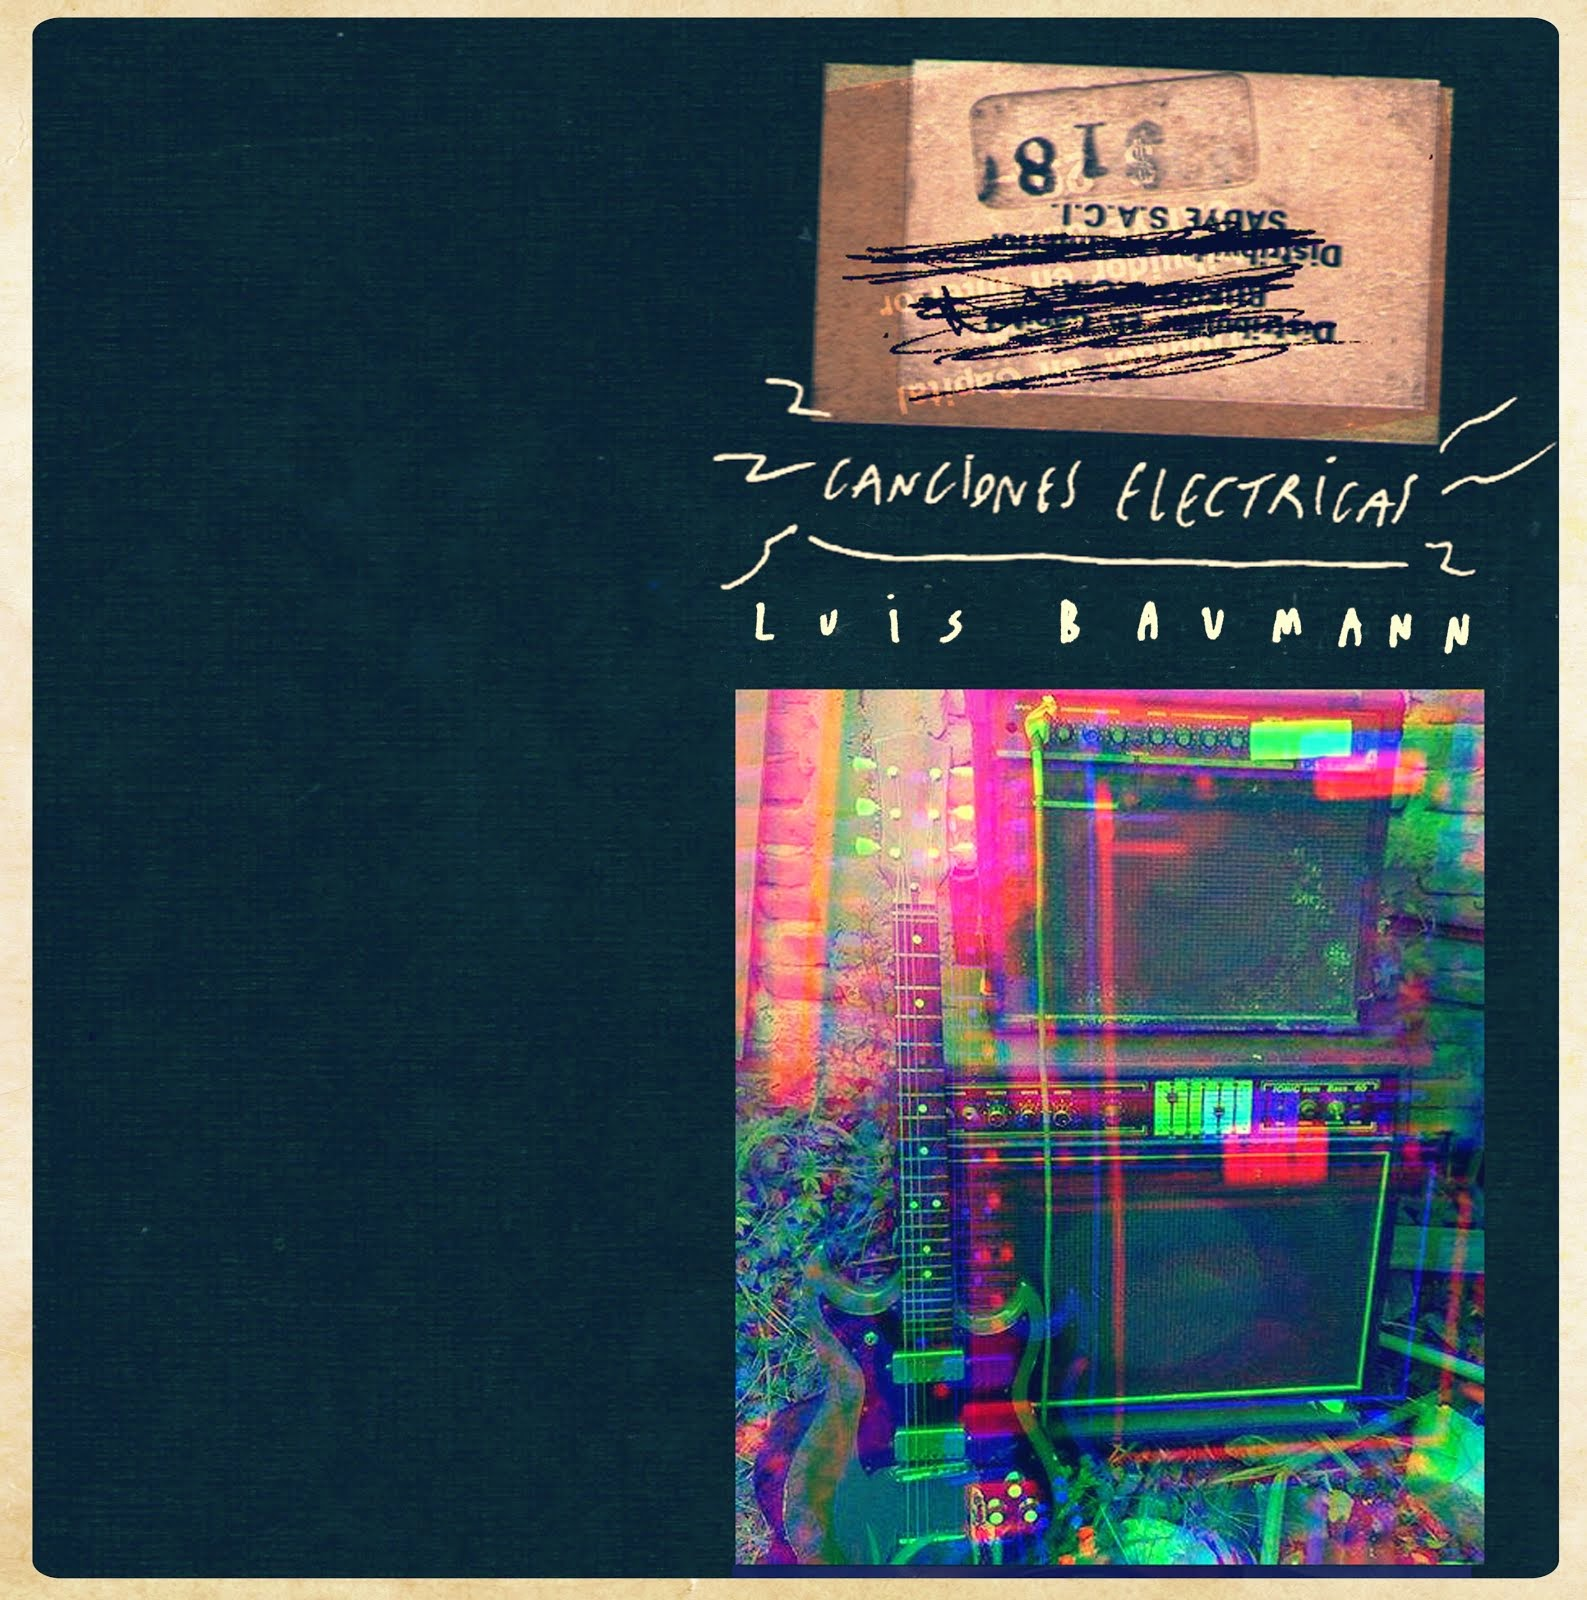 Luis baumann - Canciones eléctricas 2015